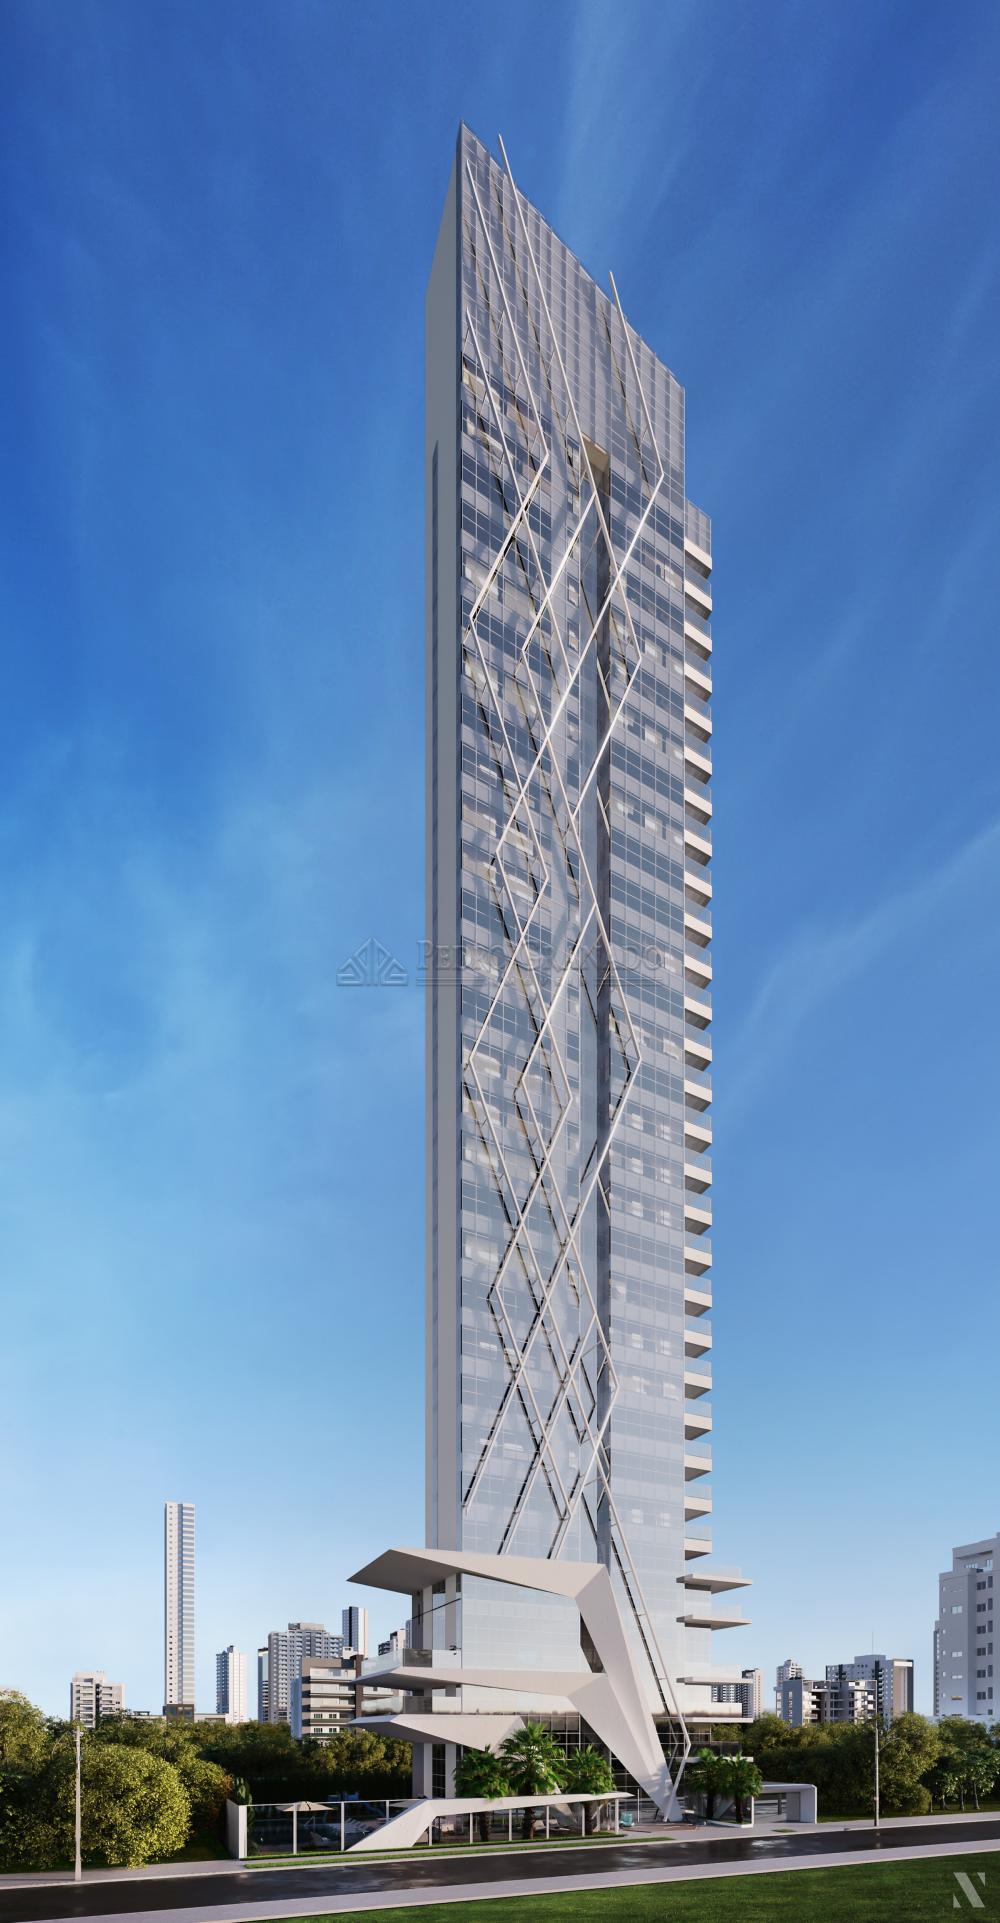 Maringa Apartamento Venda R$228.000,00 3 Dormitorios 3 Suites Area construida 174.46m2